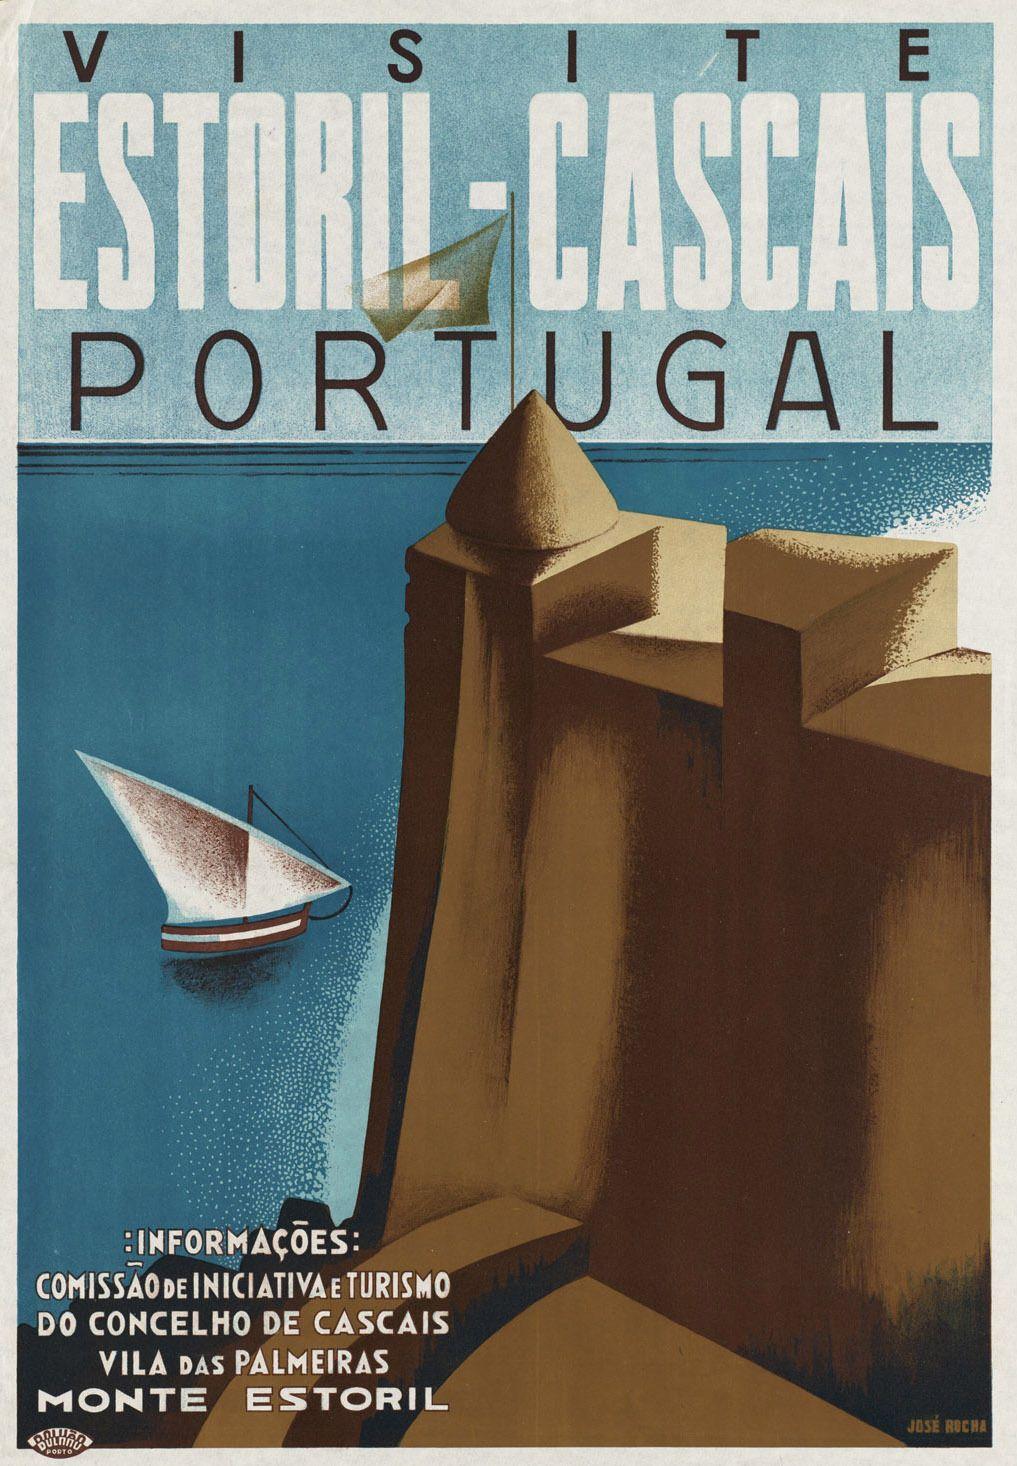 Art Vintage Travel Poster A1A2A3A4Sizes Visit BELGIUM..